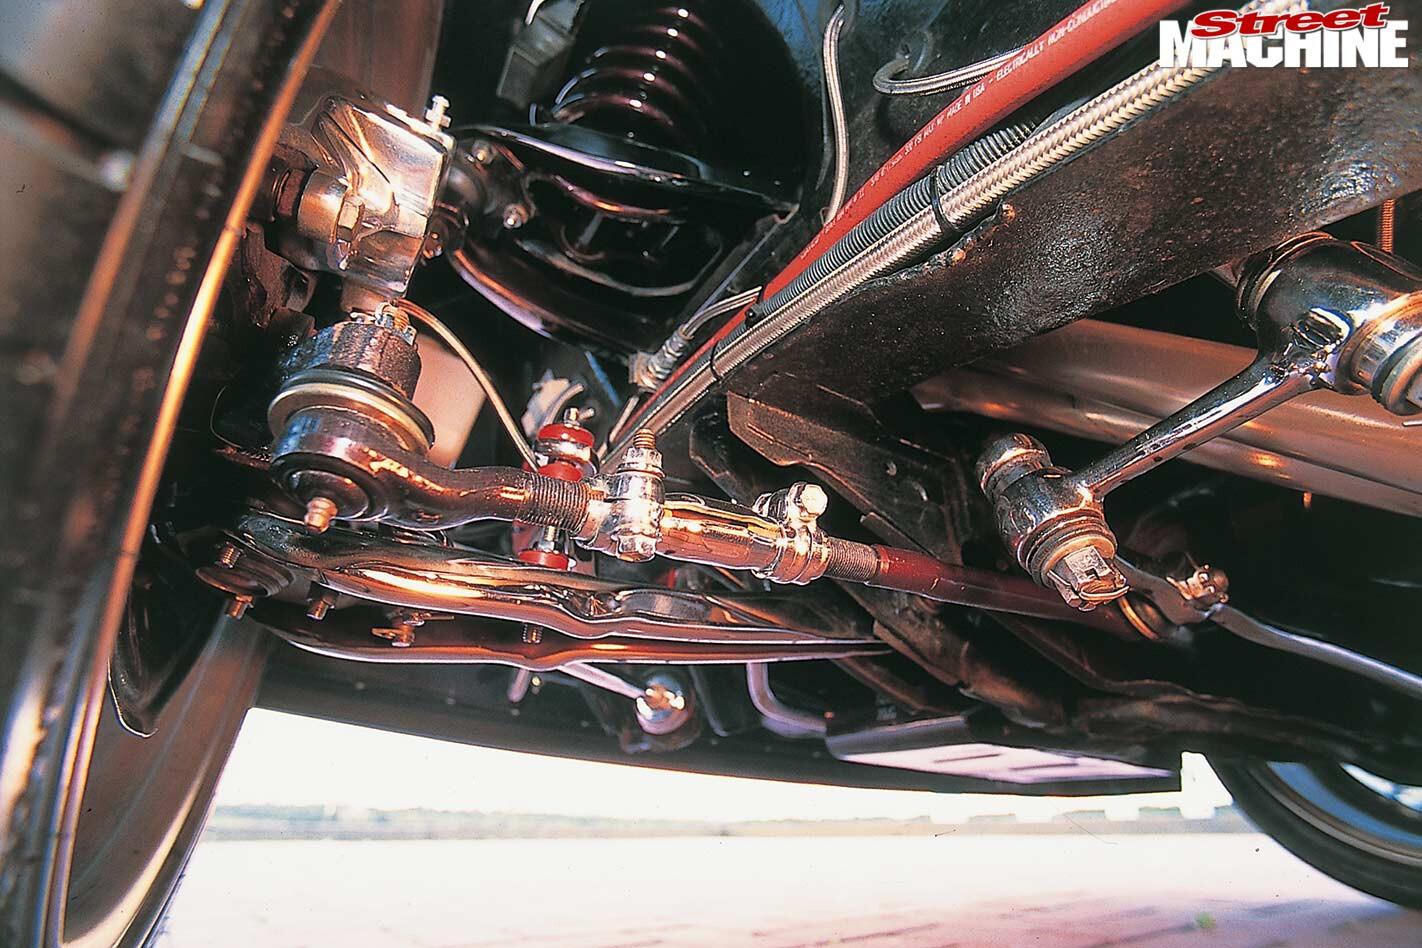 Ford Falcon underside